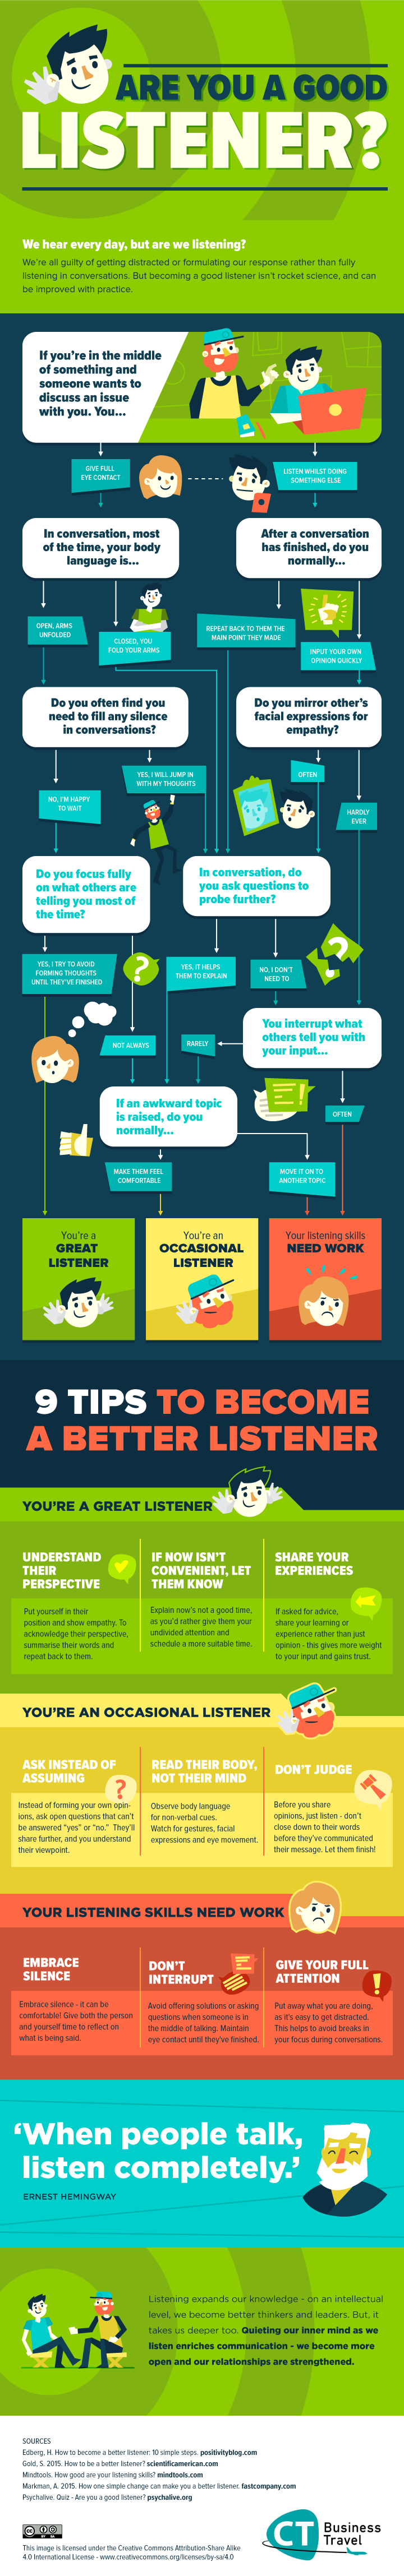 good-listener-infographic